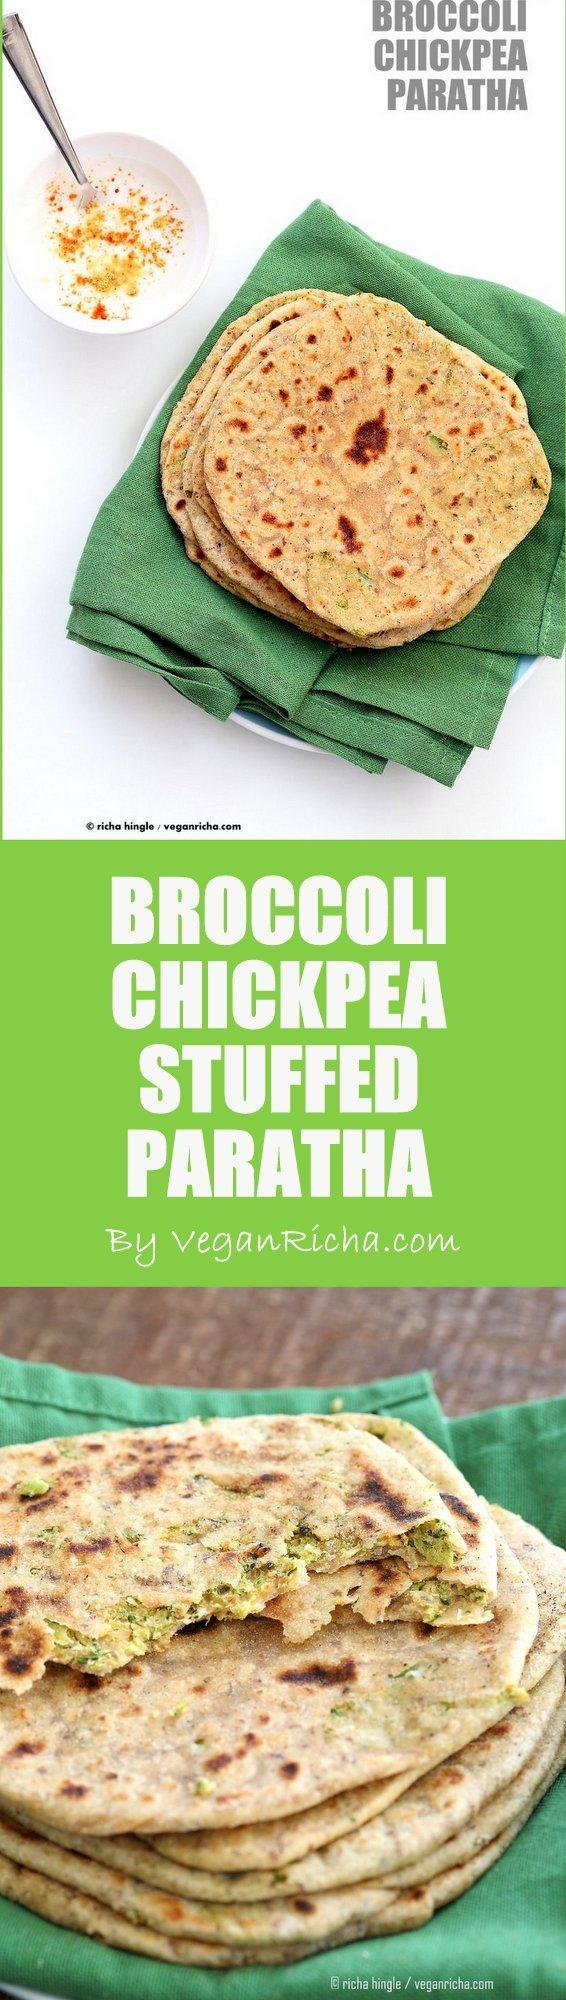 Broccoli Chickpea Stuffed Flatbread - Broccoli Paratha. Shredded broccoli, mashed chickpeas and spices stuffed in a paratha flatbread.   VeganRicha.com Vegan Indian Recipe Soyfree